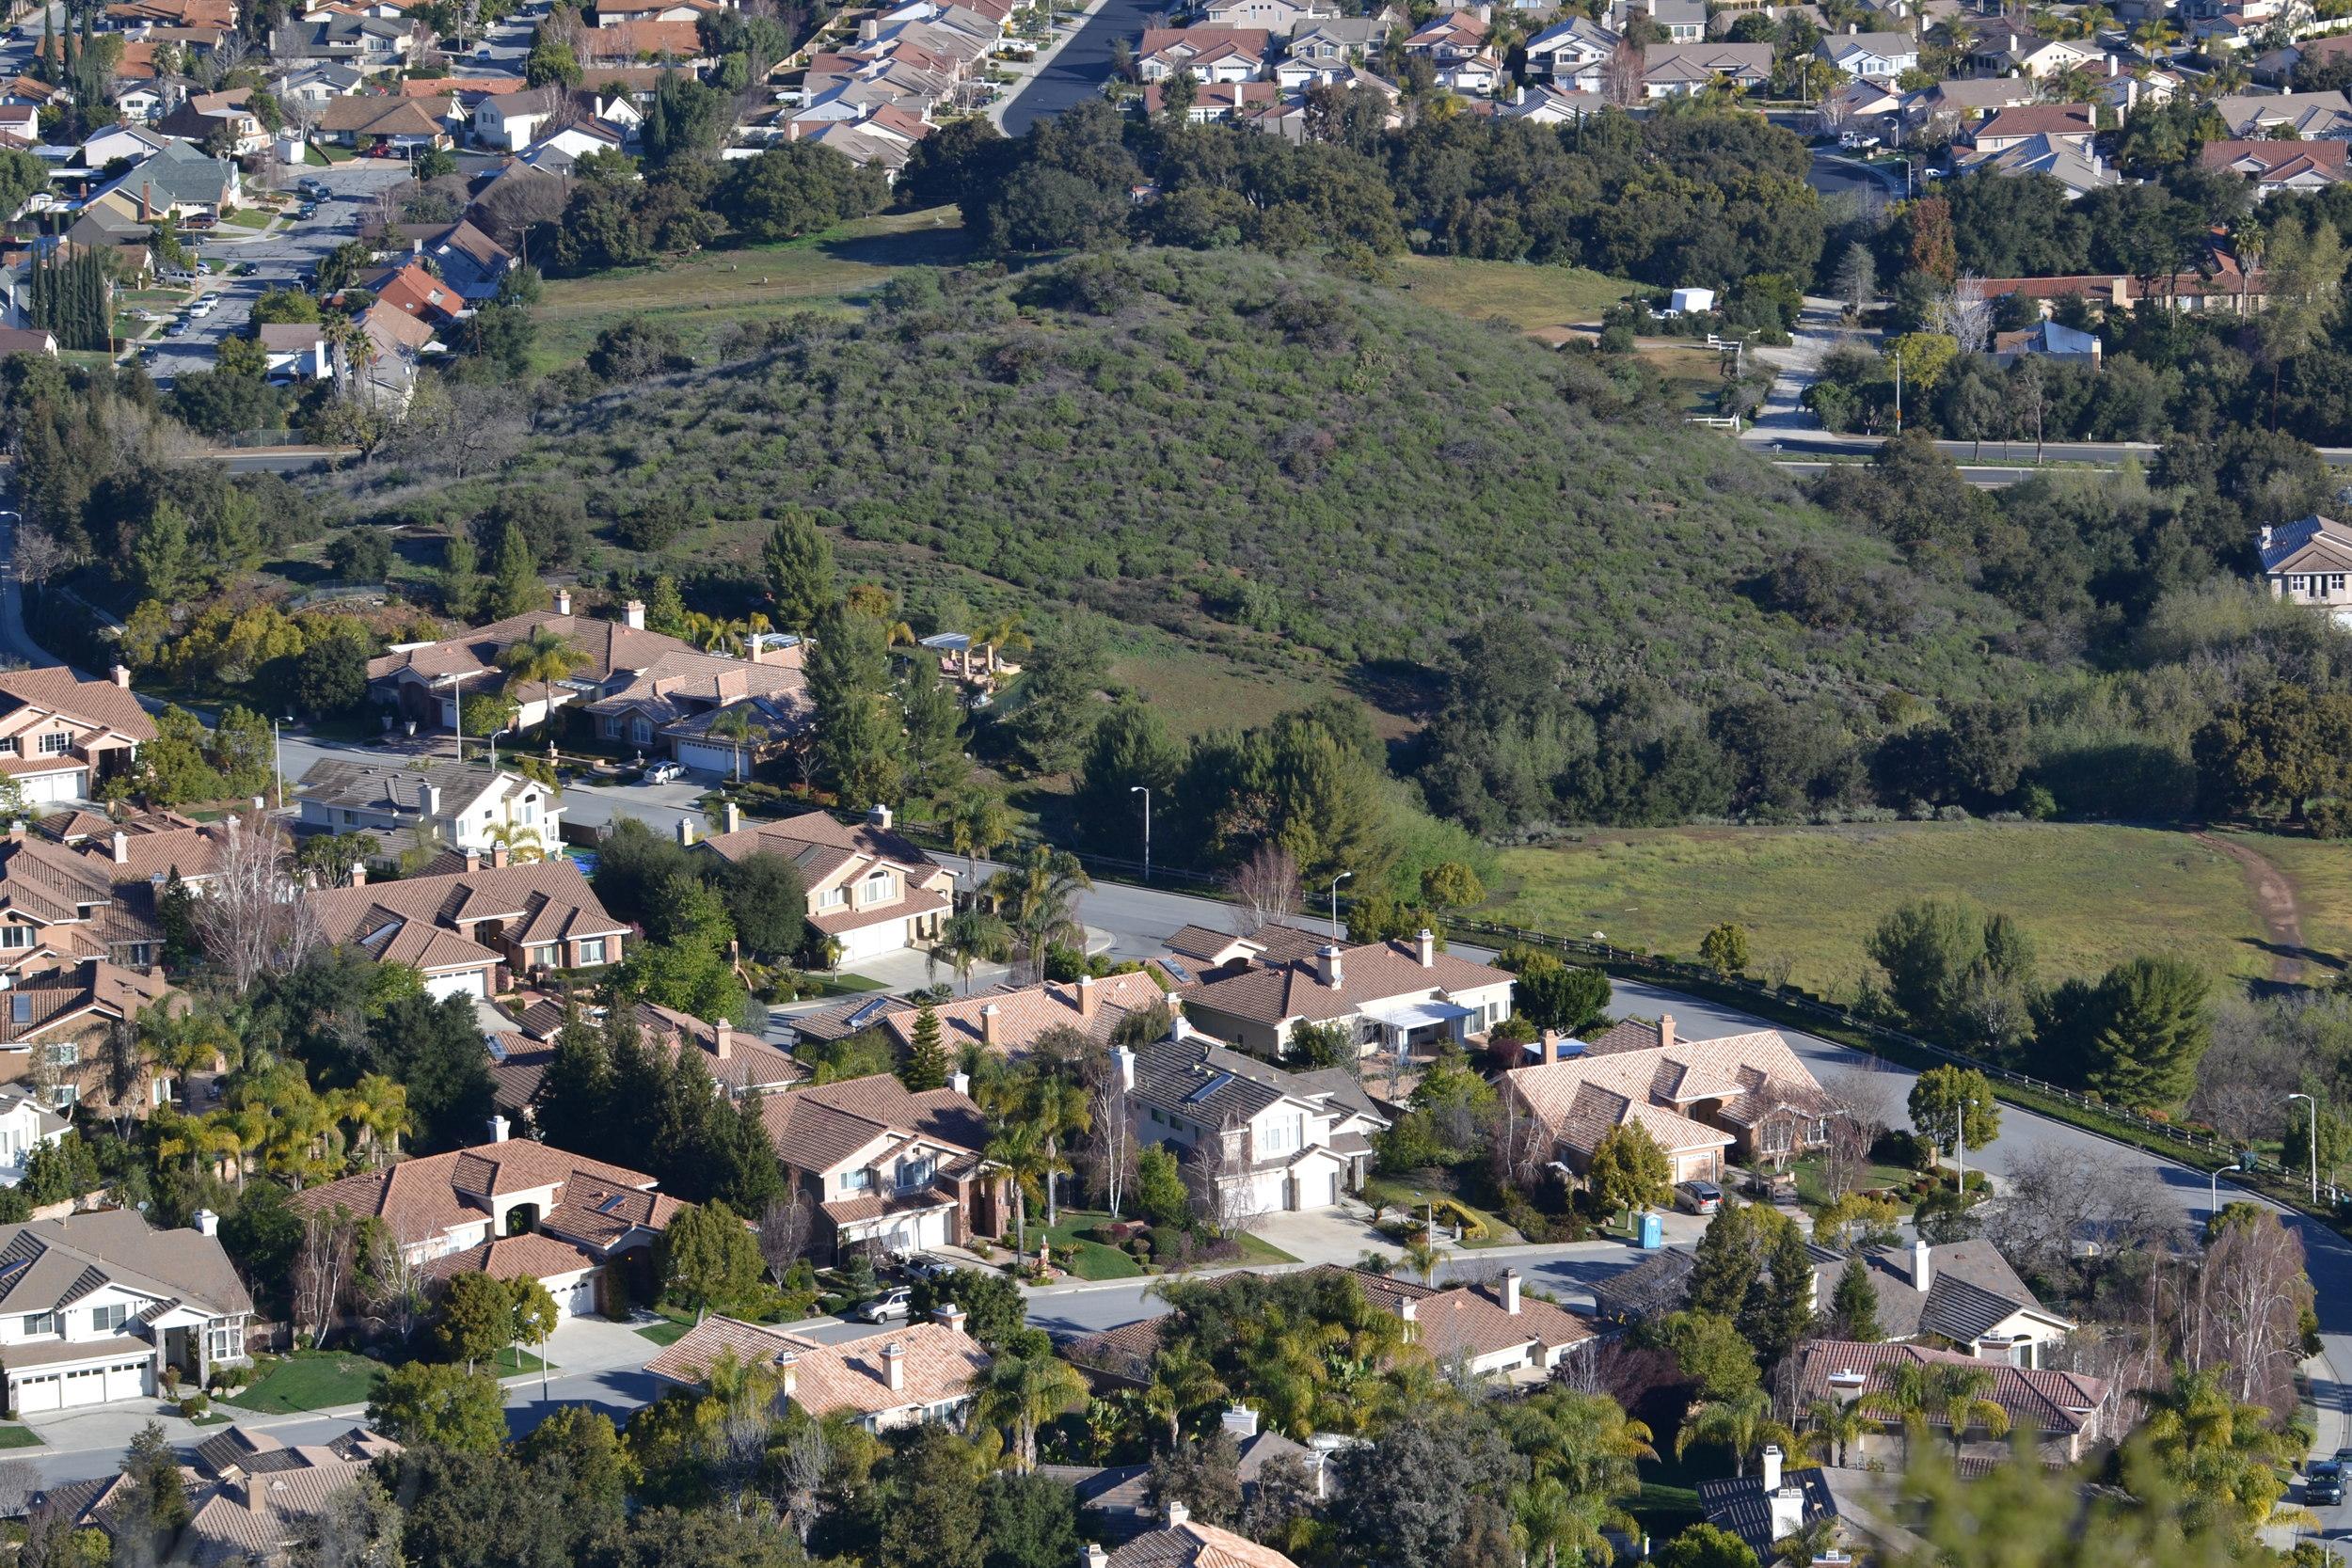 Rosewood Subdivision, Regal Oak Court, Thousand Oaks